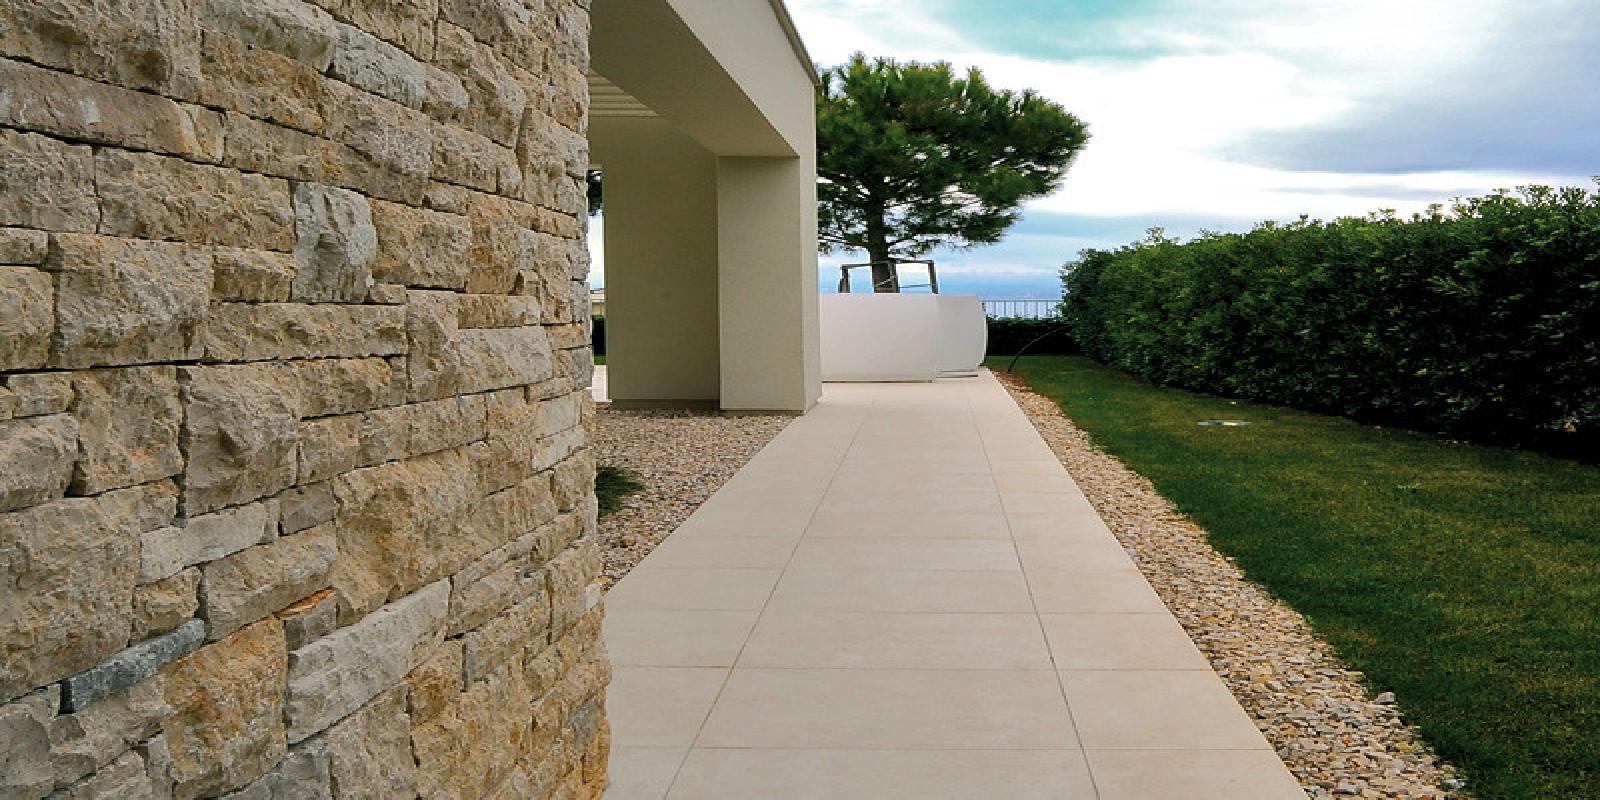 Pavimenti per esterni piastrelle sottili posa su pavimenti - Piastrelle pavimento esterno ...